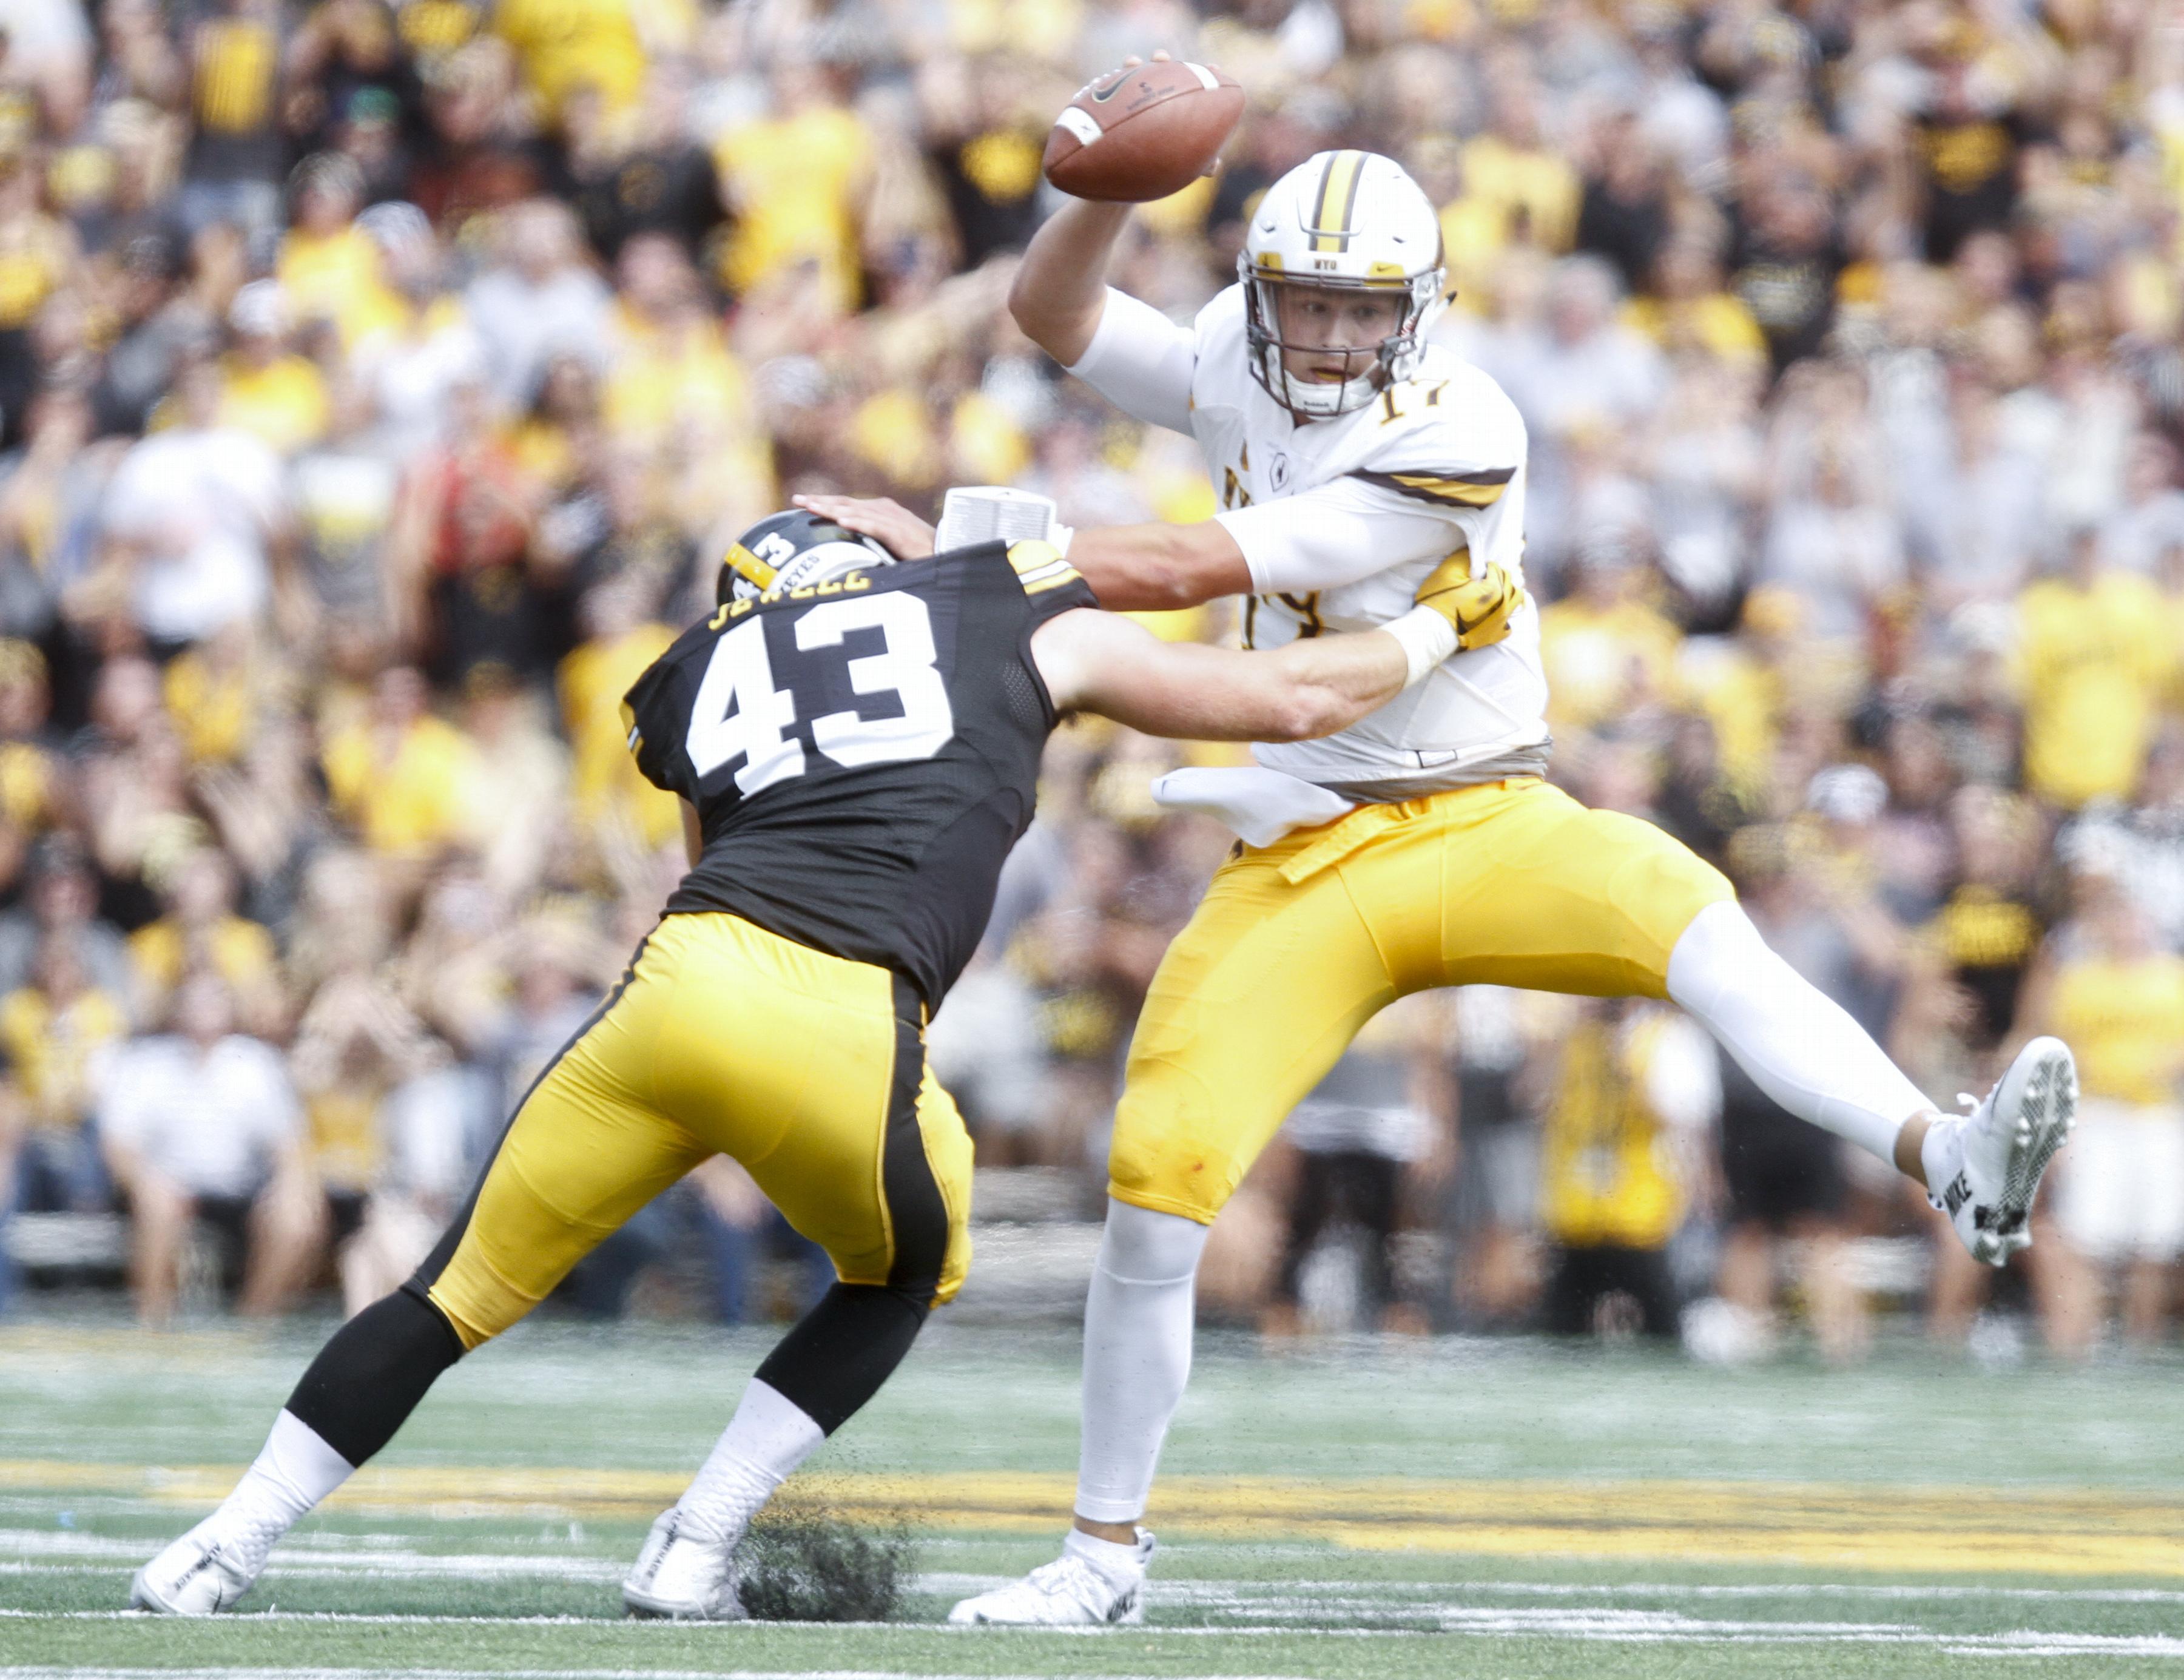 Iowa ILB Josey Jewell pursues WyomingQB Josh Allen on September 2, 2017